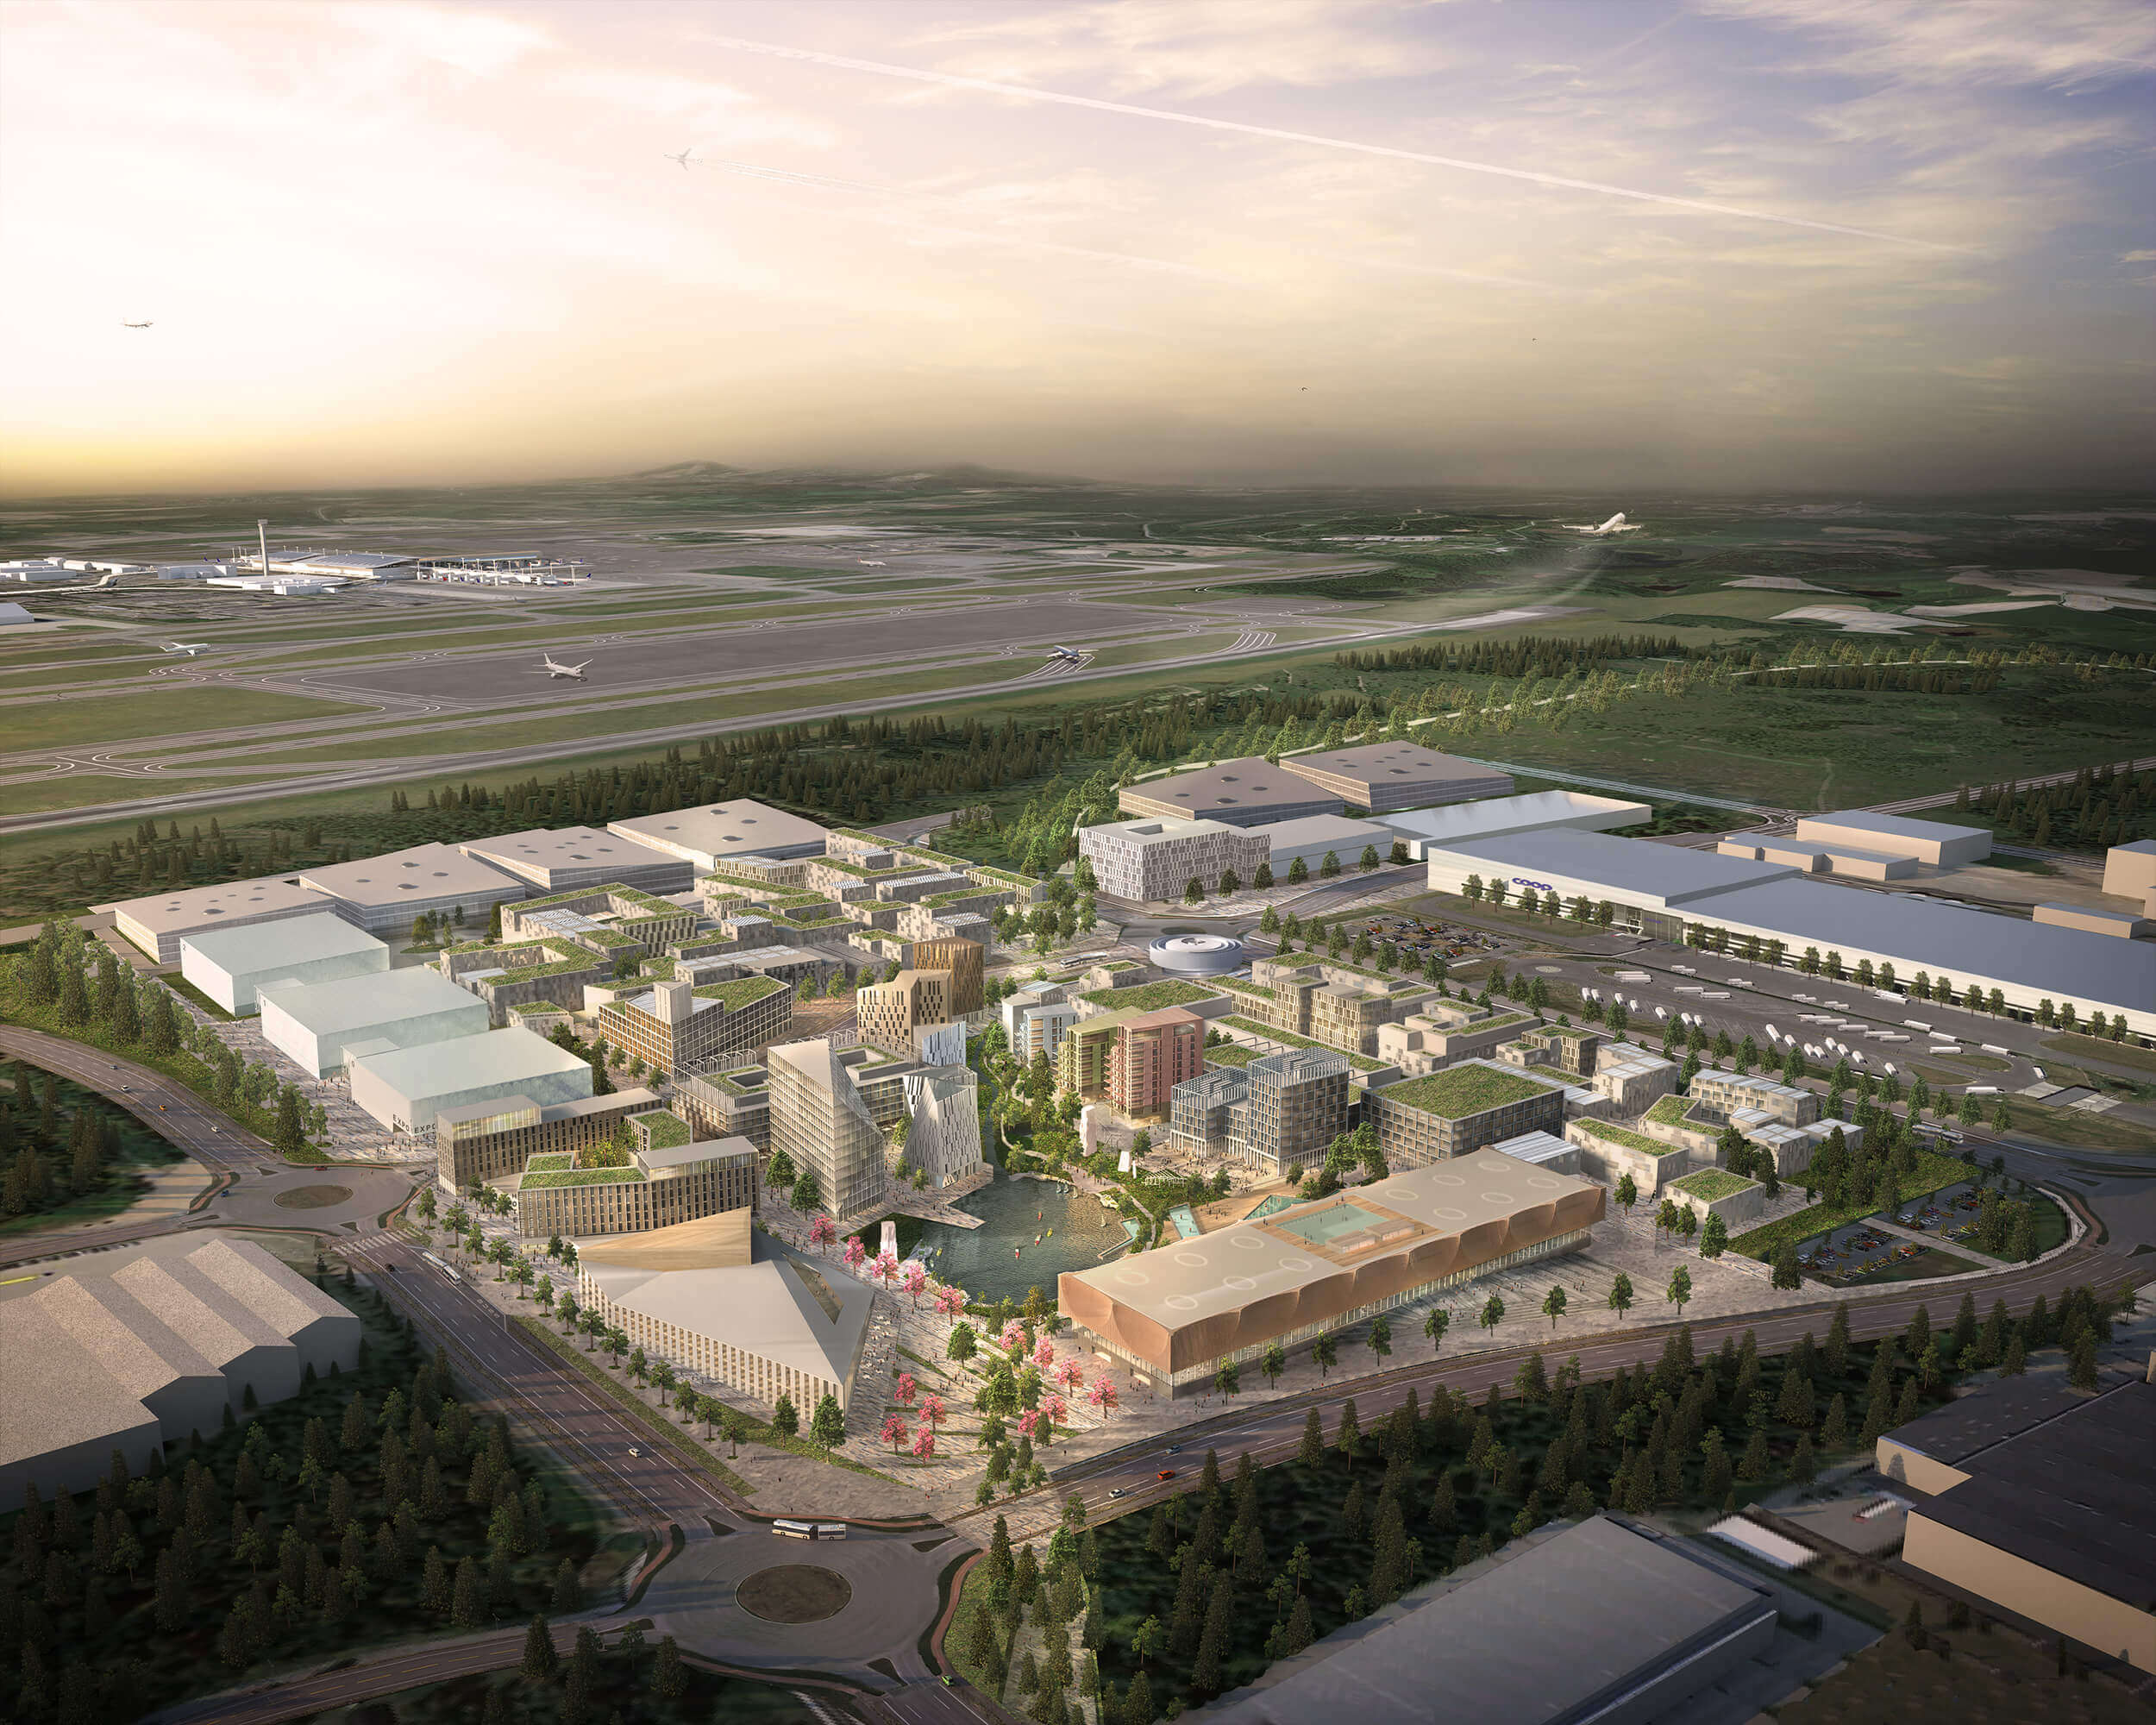 Oslo Airport City